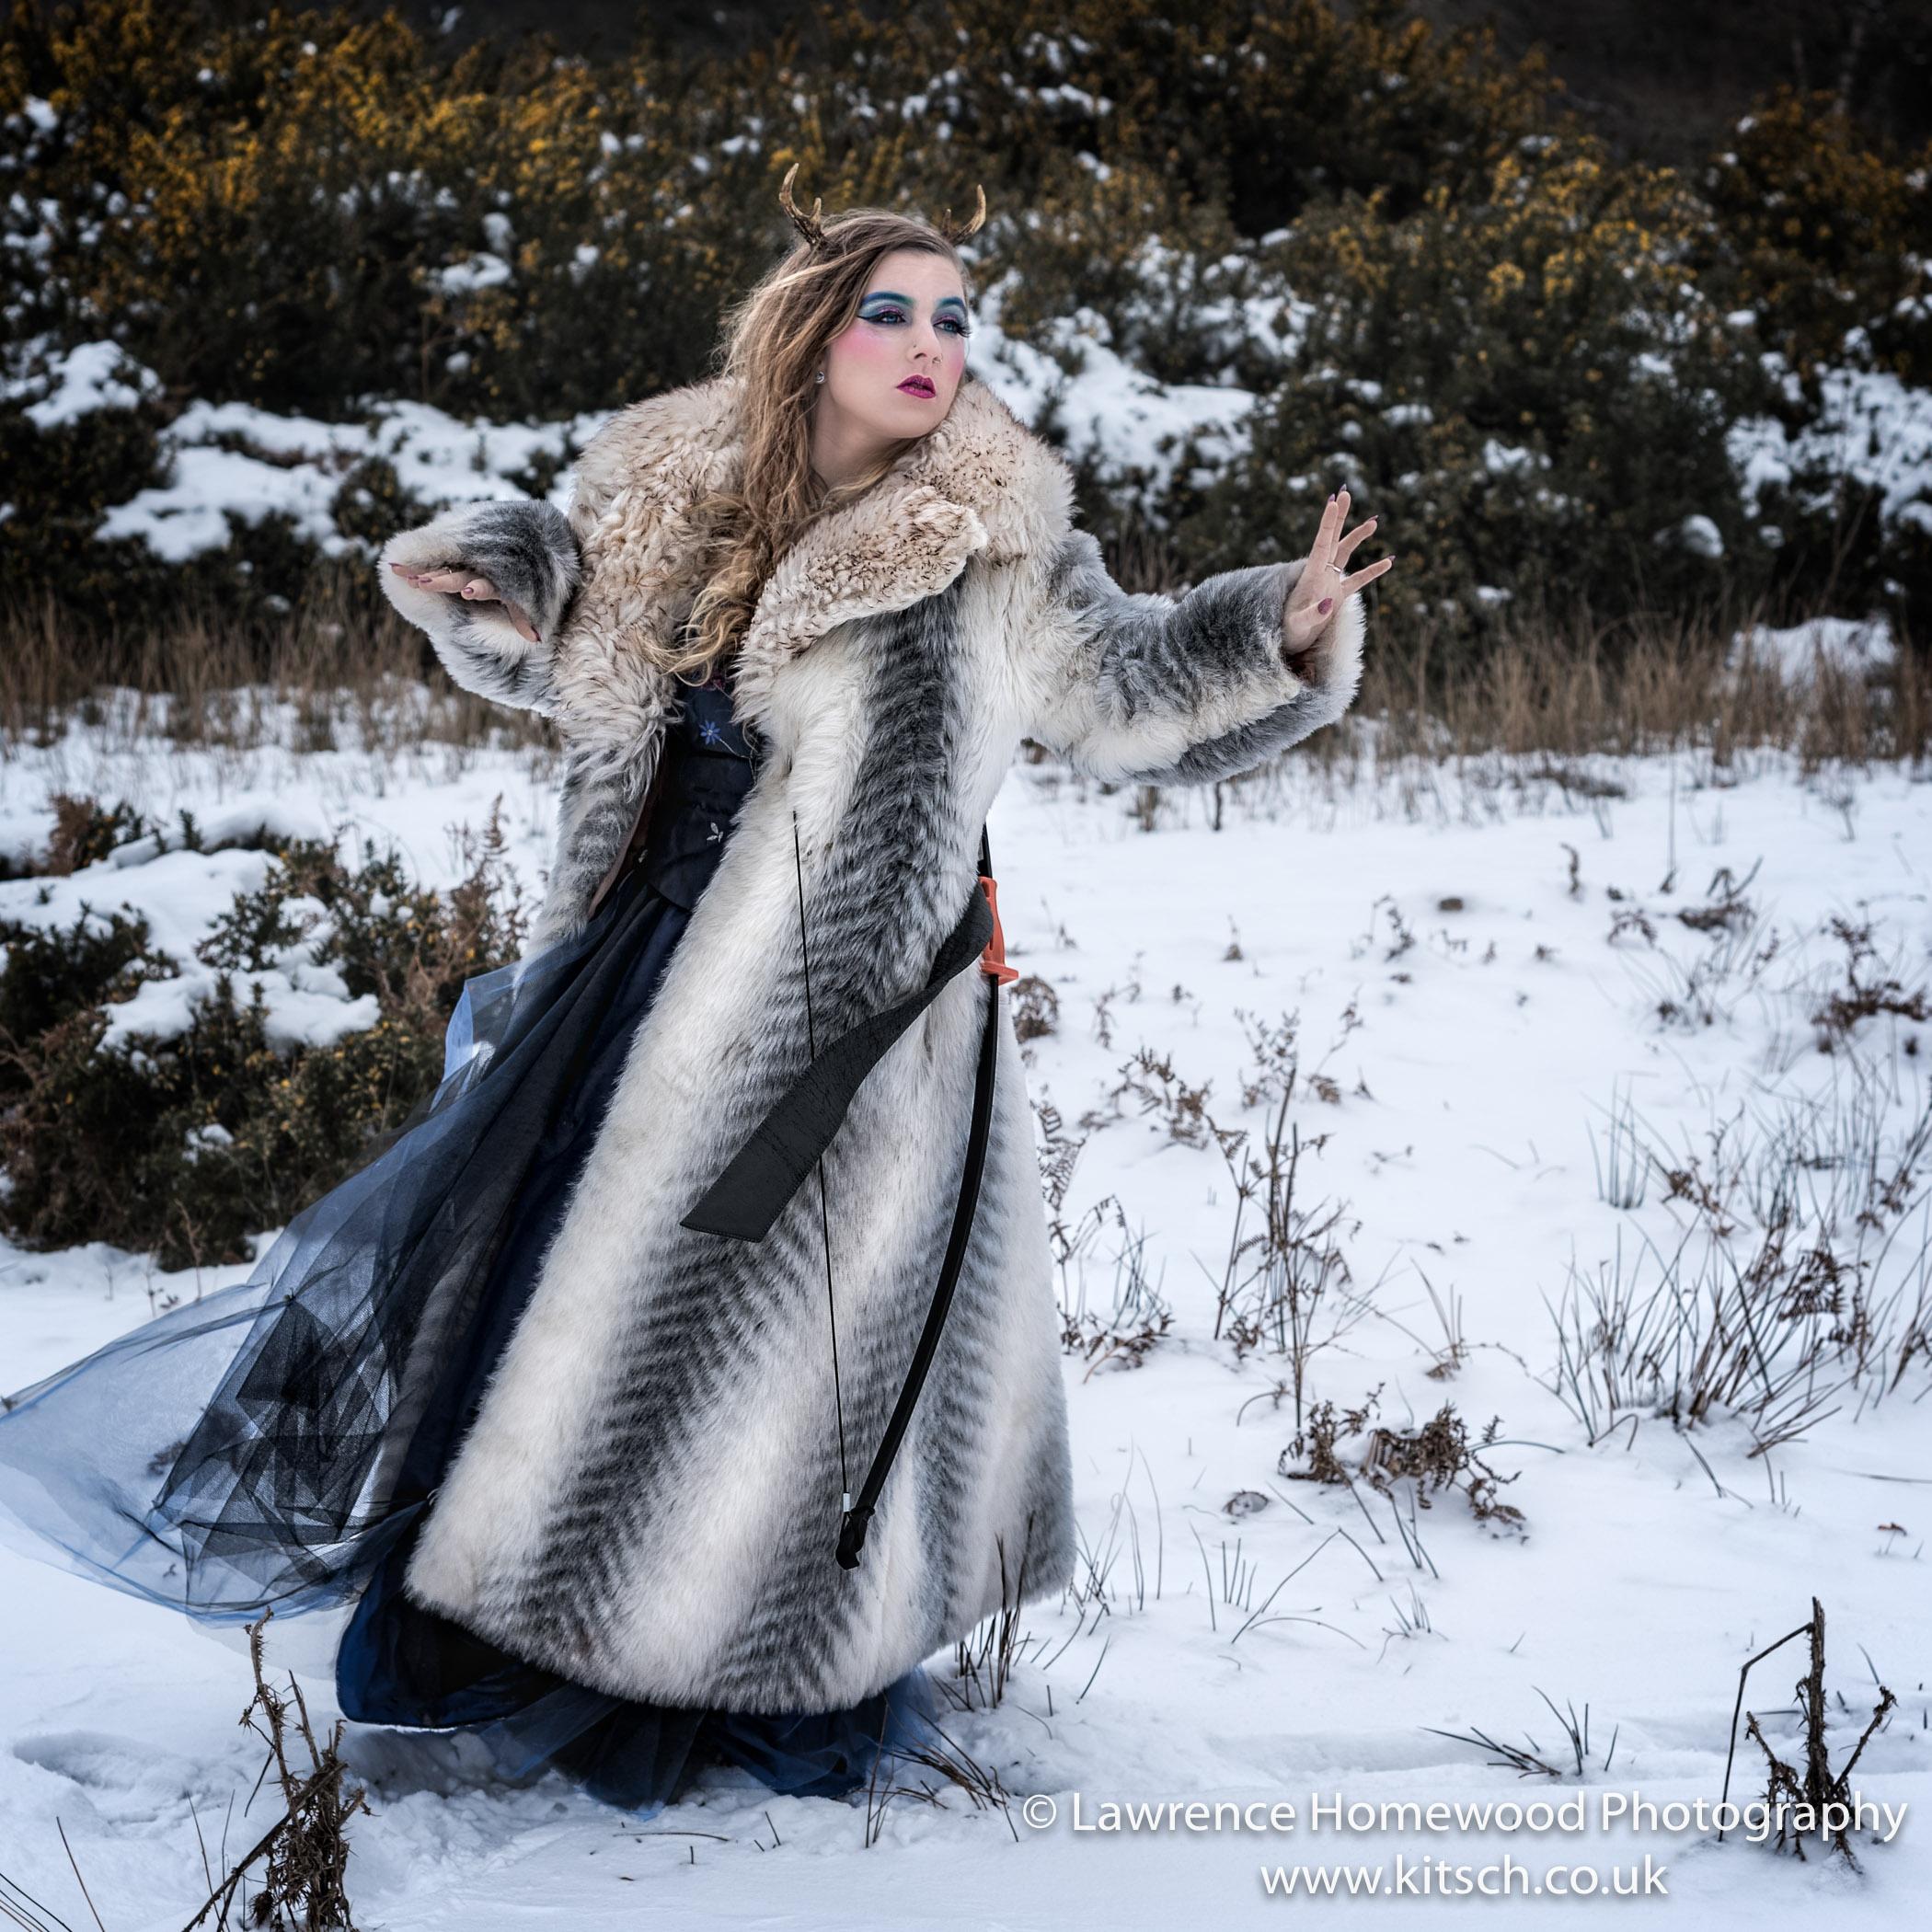 Fawn Princess - A Winters Tale15